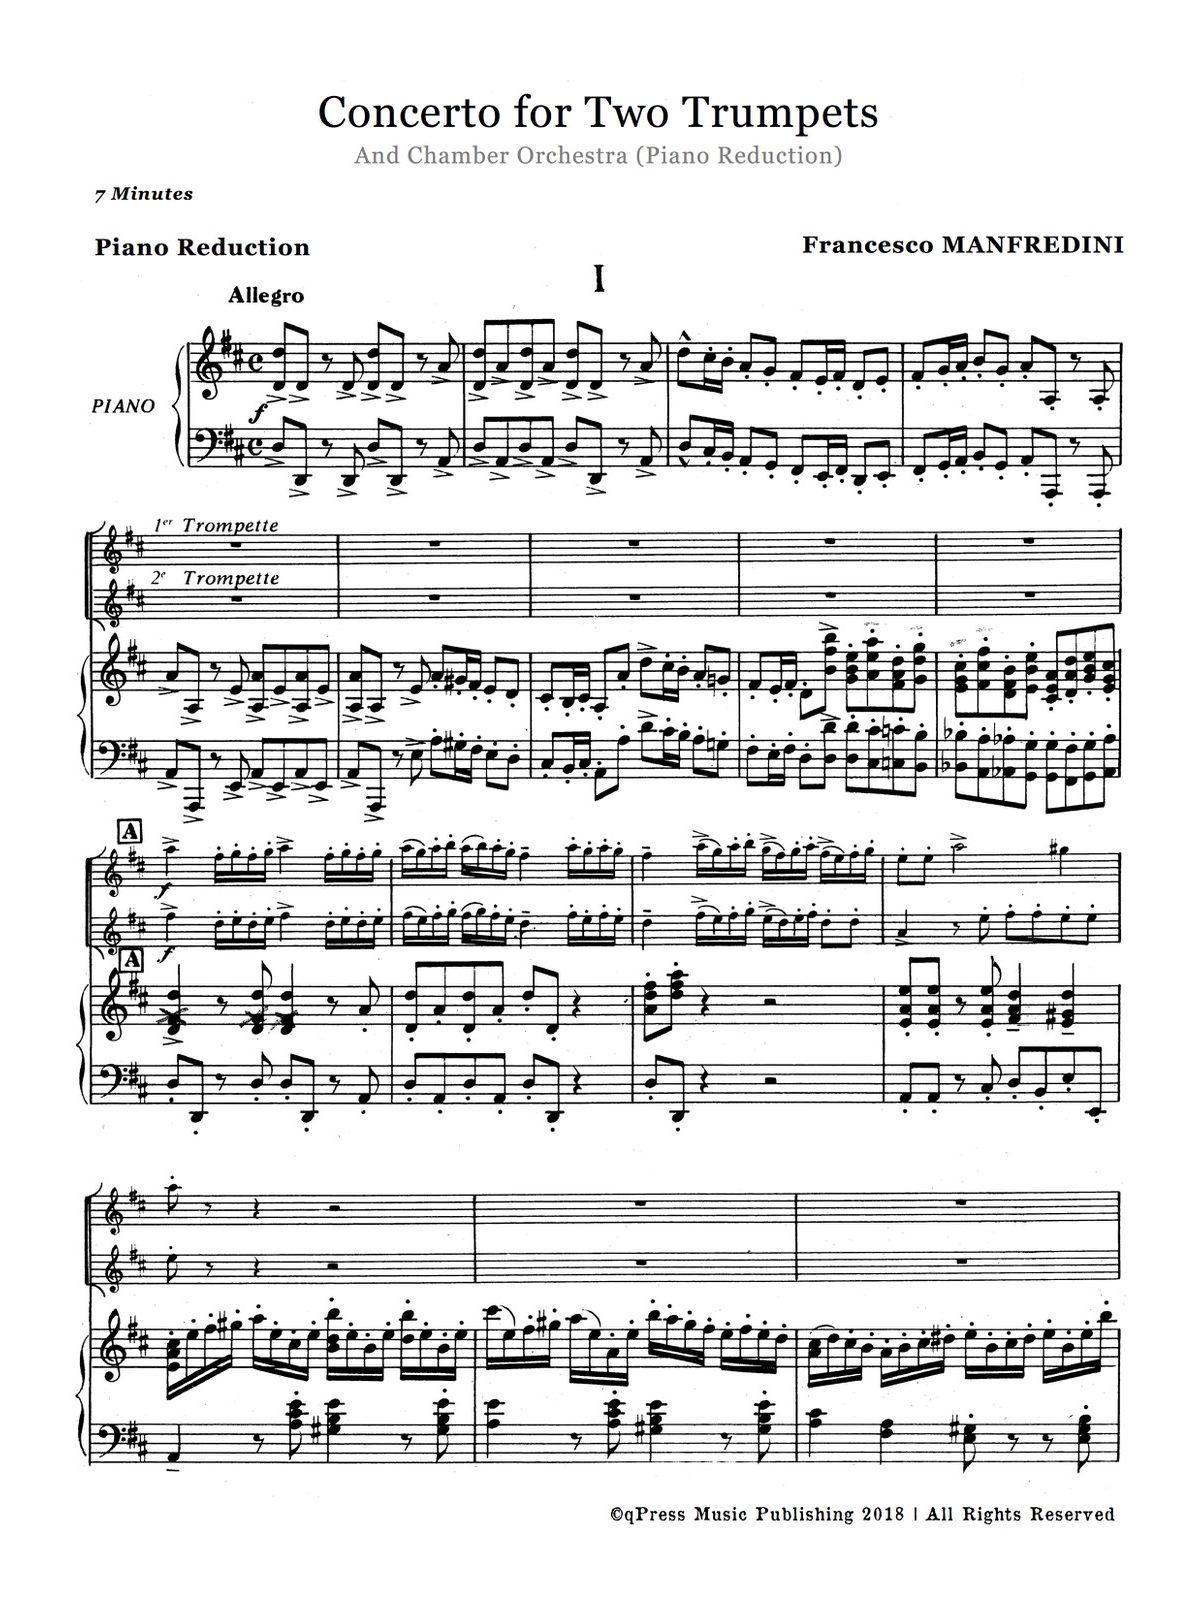 Manfredini, Concerto for Two Trumpets (Score and Parts)-p11